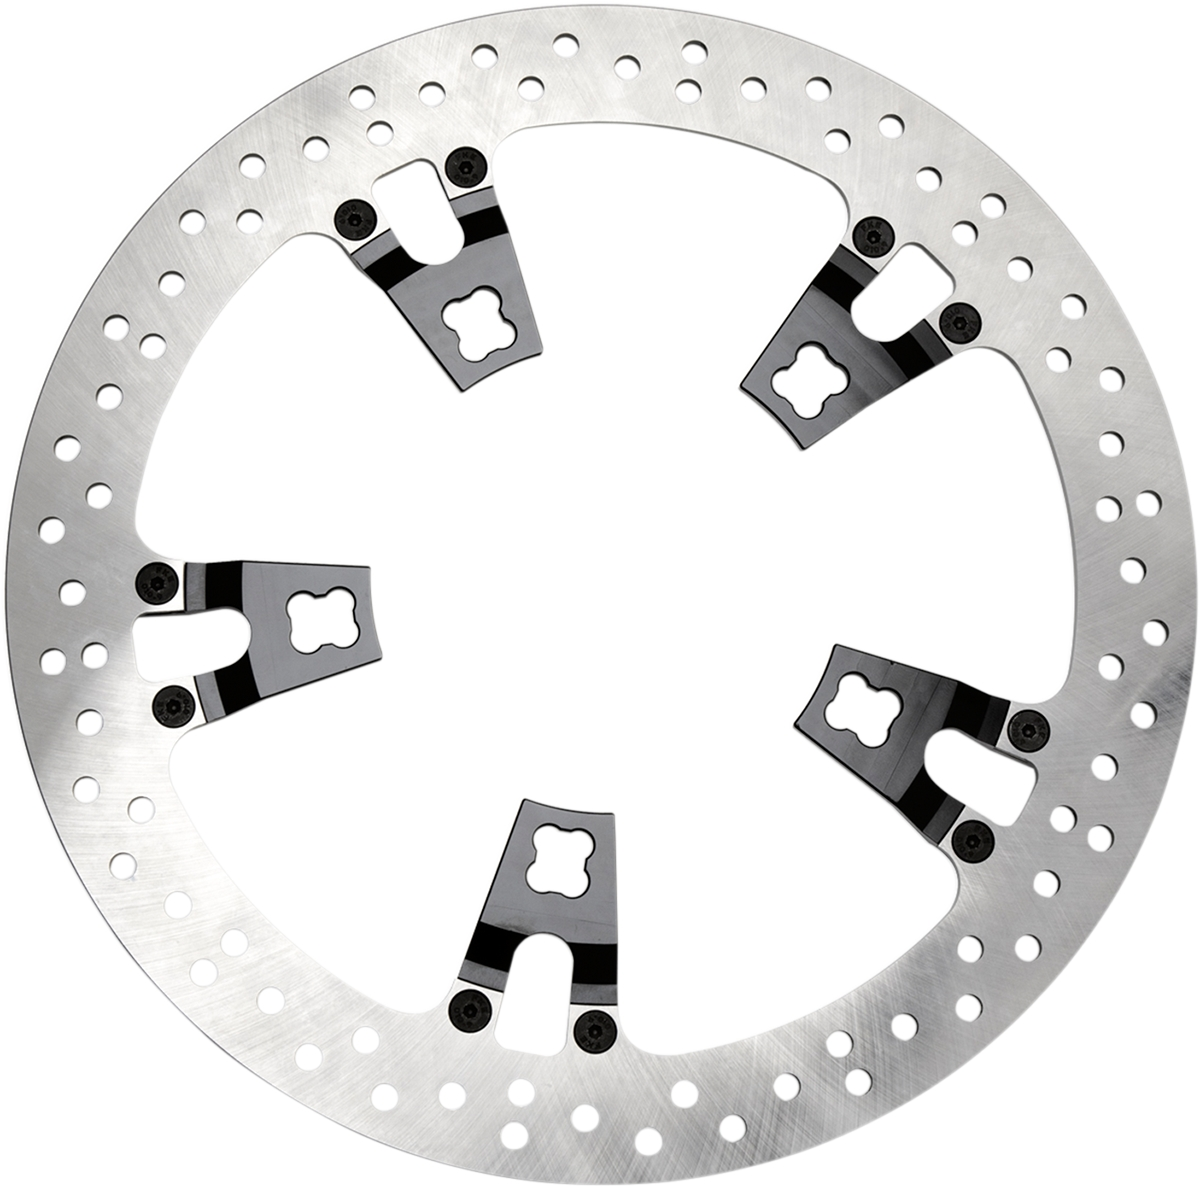 Arlen Ness Big Brake Floating Rotor Kits